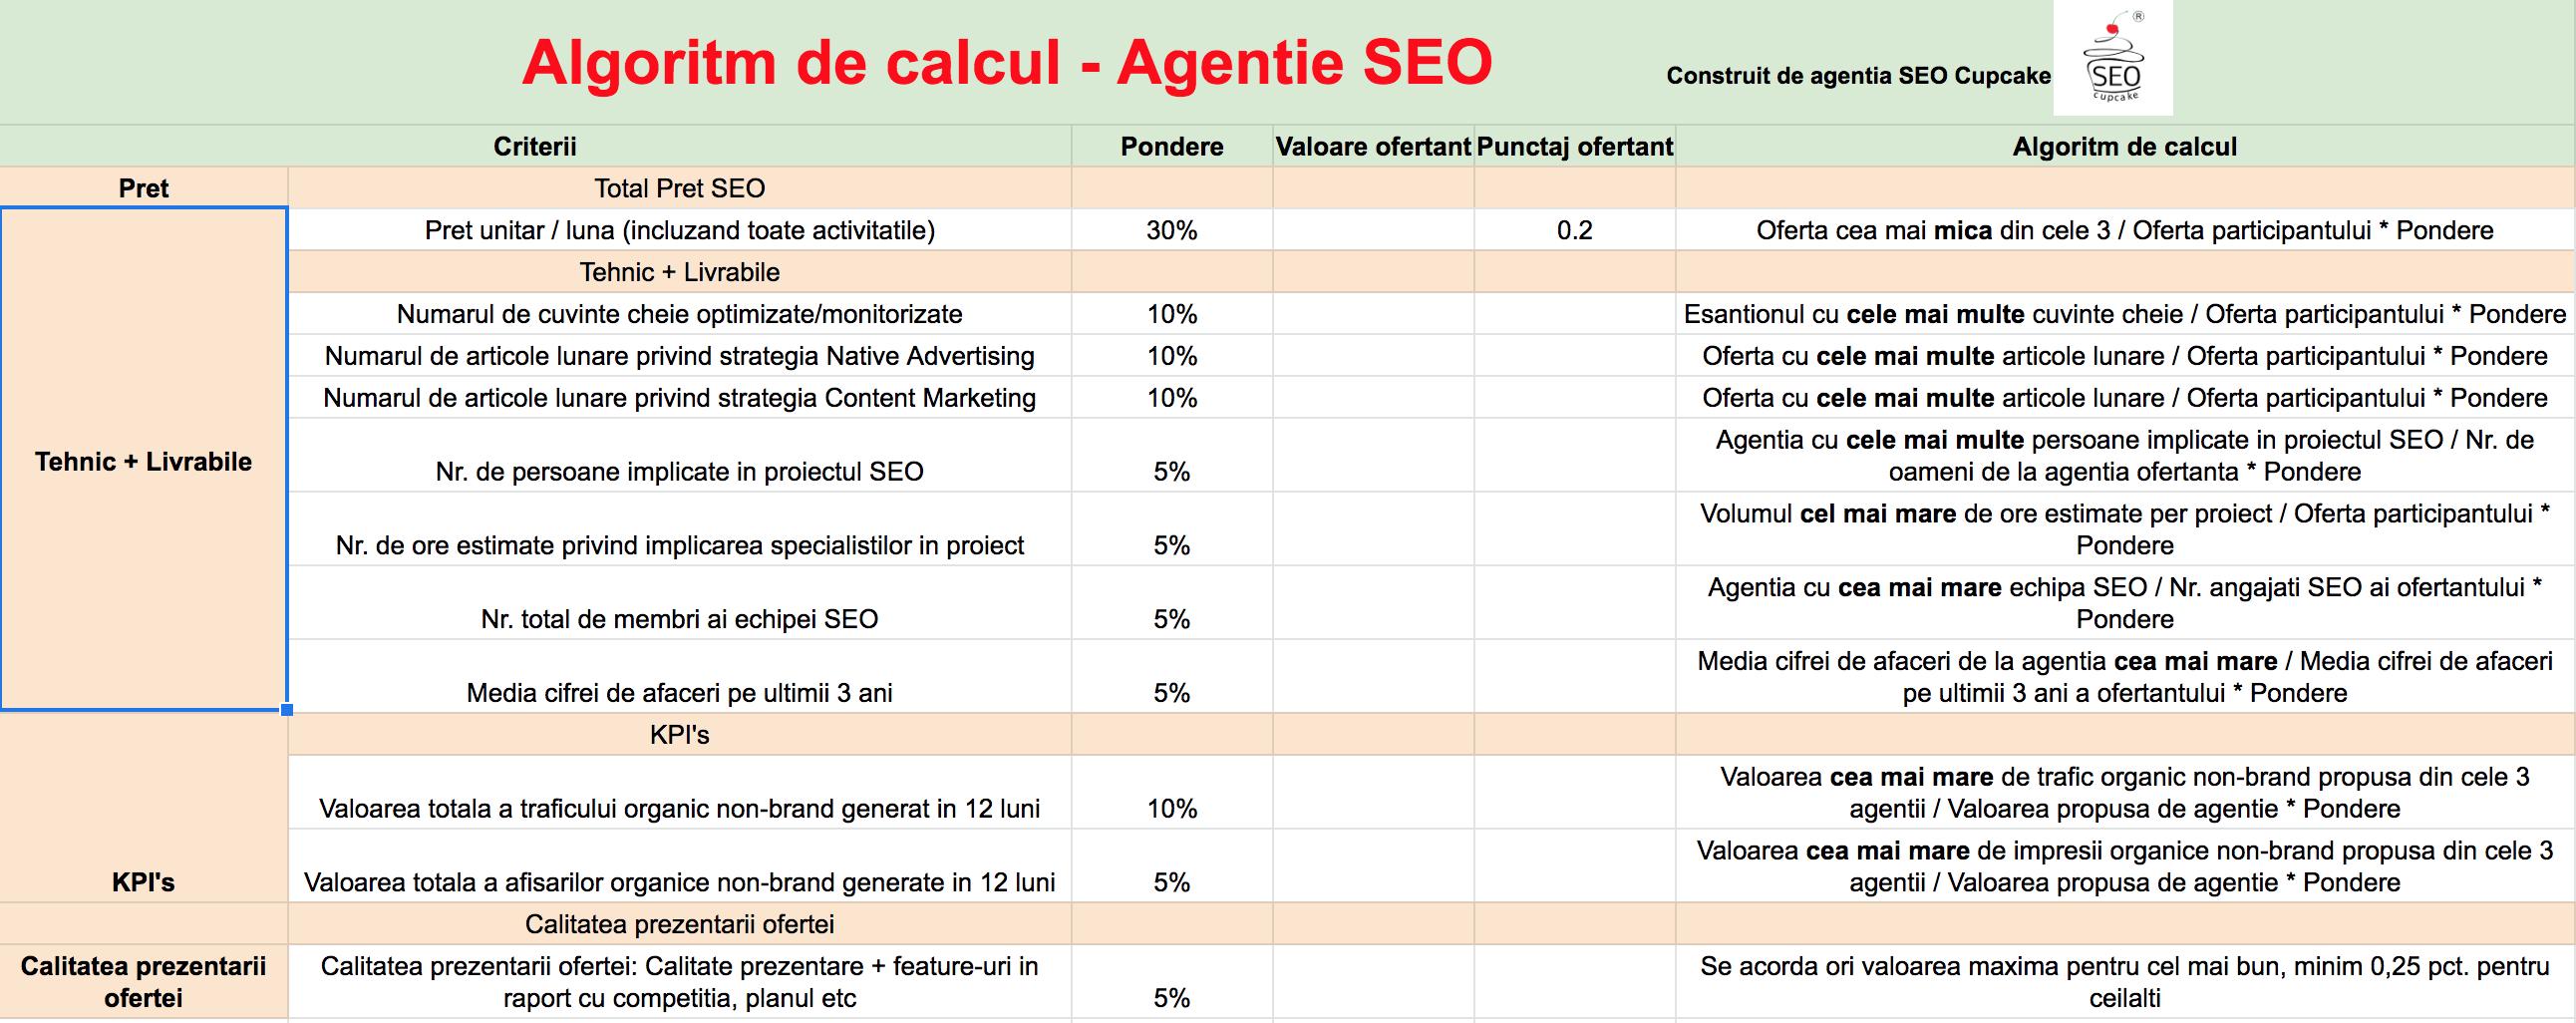 agentie seo - algoritm si formula de calcul pitch servicii SEO